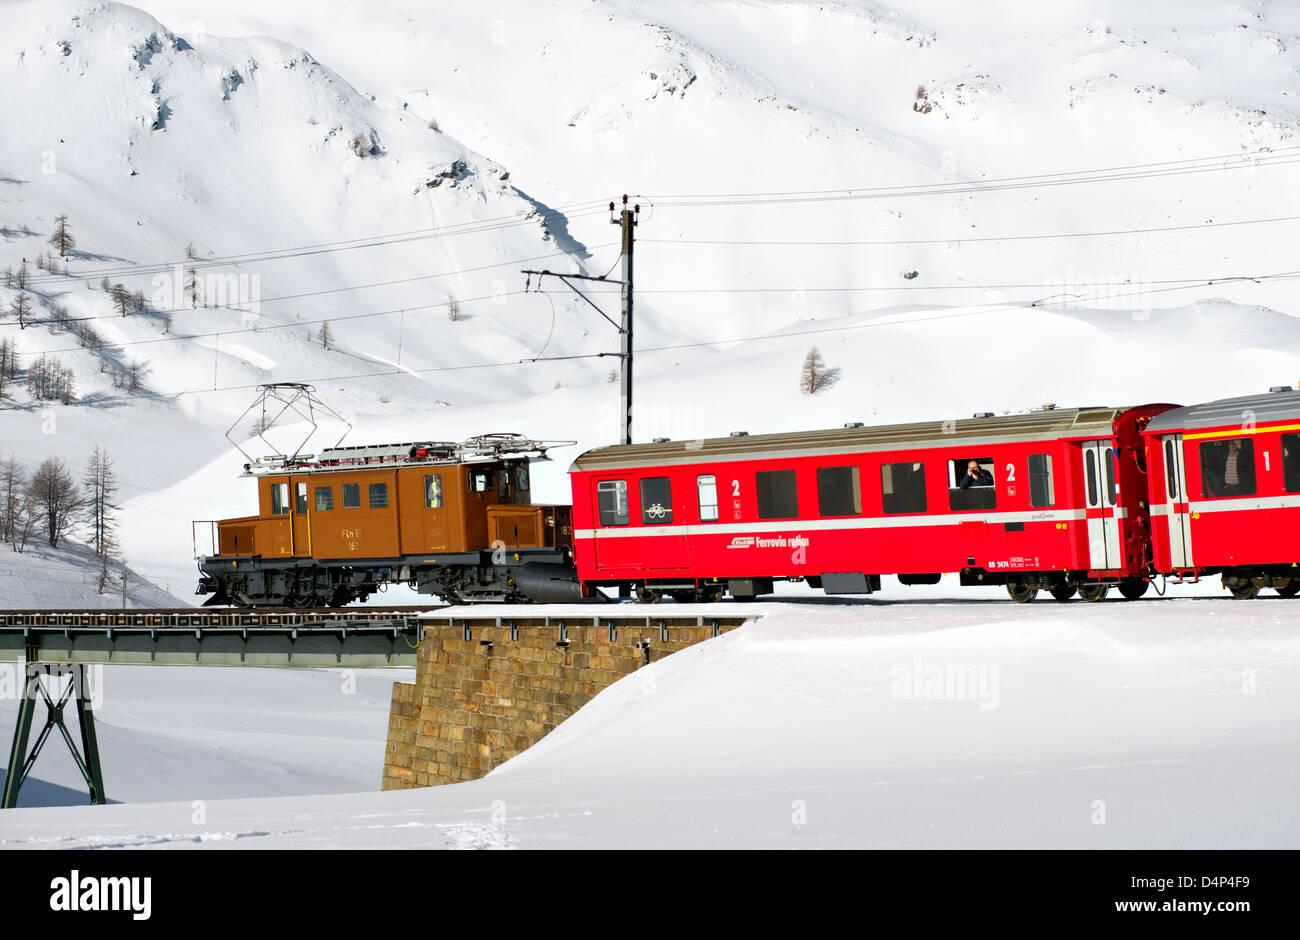 Krokodil Lokomotive der Rhaetischen Bahn am Bernina Pass, Schweiz | Crocodile locomotive, Bernina Pass, Switzerland - Stock Image